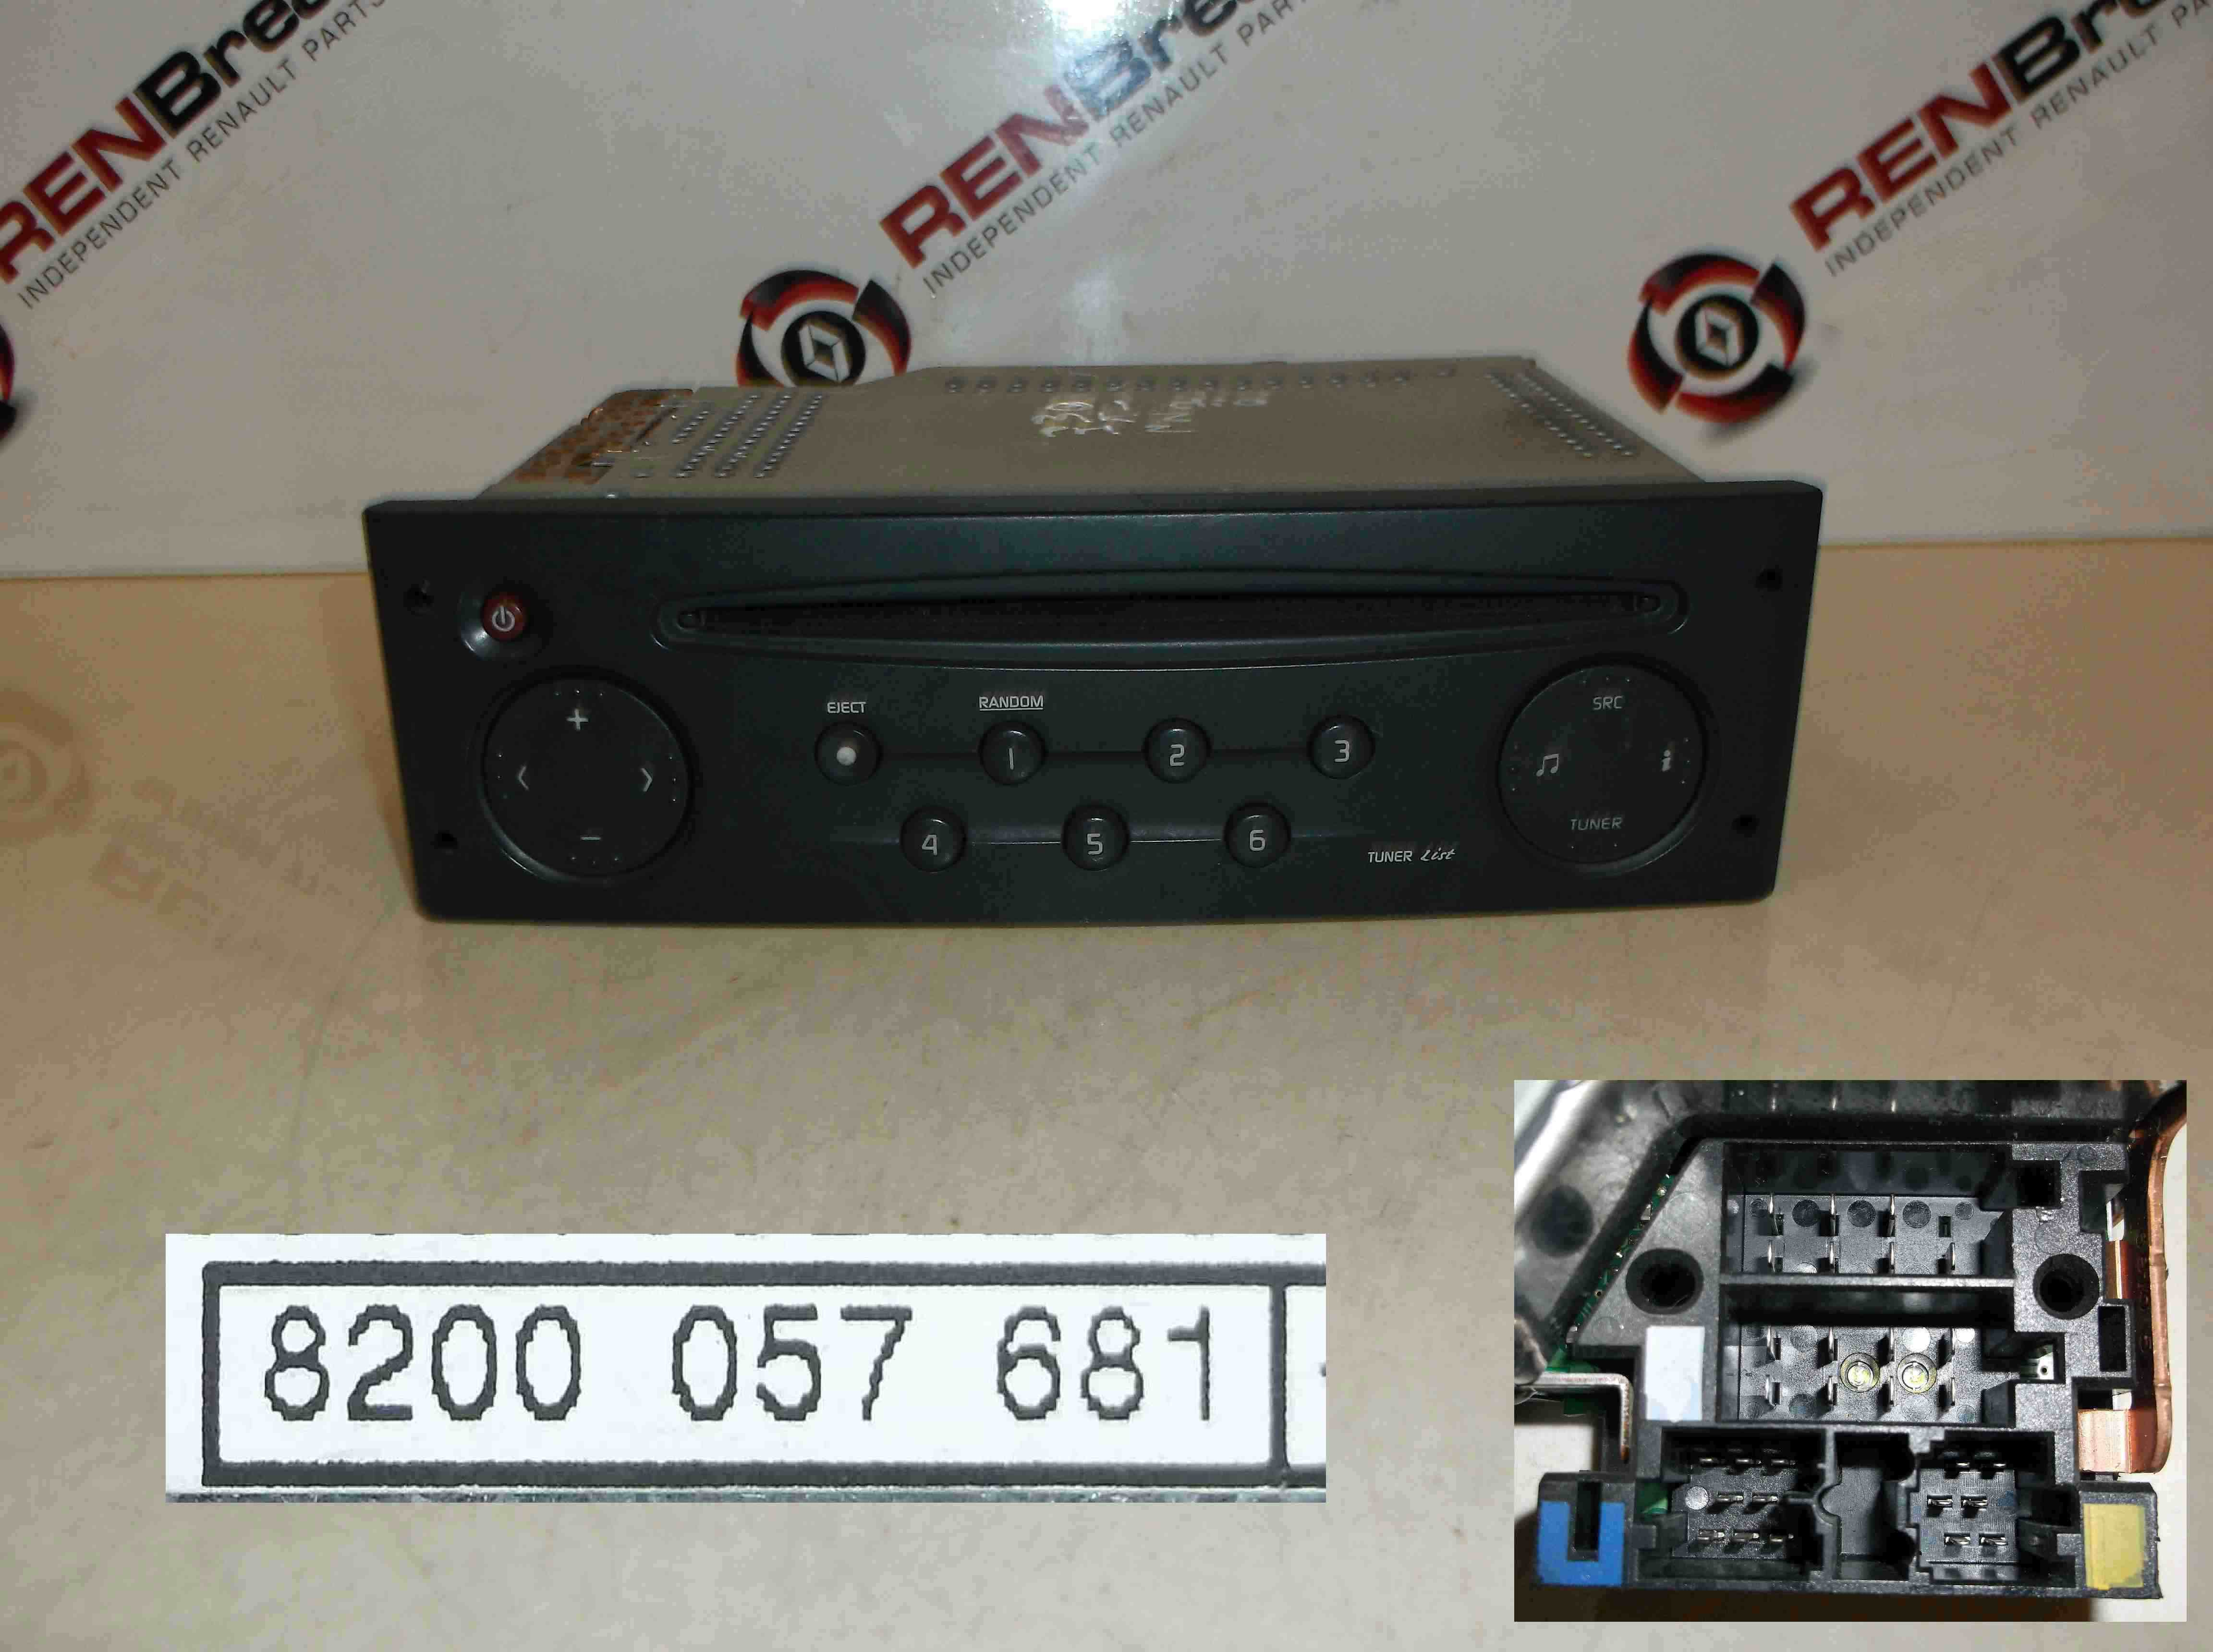 Renault Clio MK3 2005-2009 CD Player Radio Tuner List + Code 8200057681